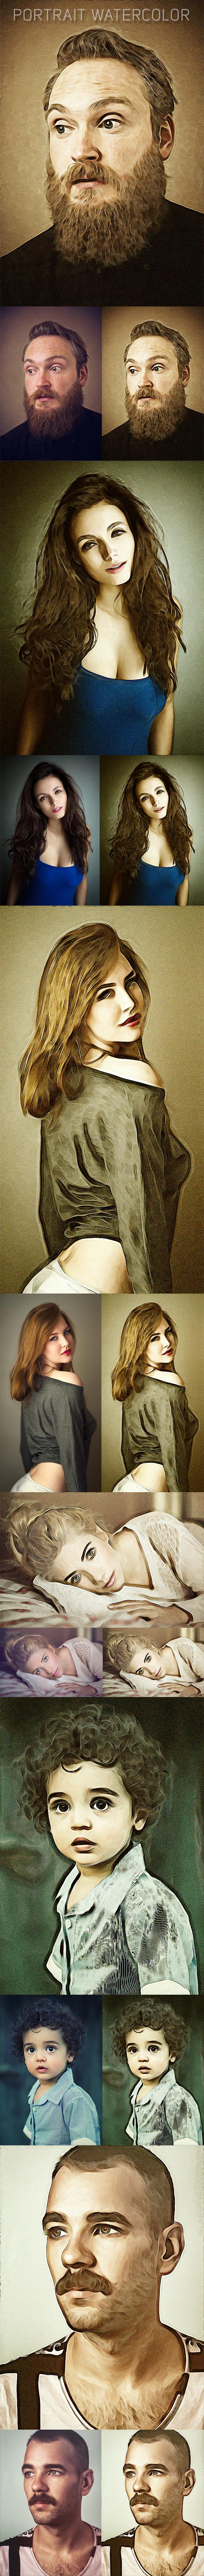 Portrait Watercolor - Photo Effects Actions